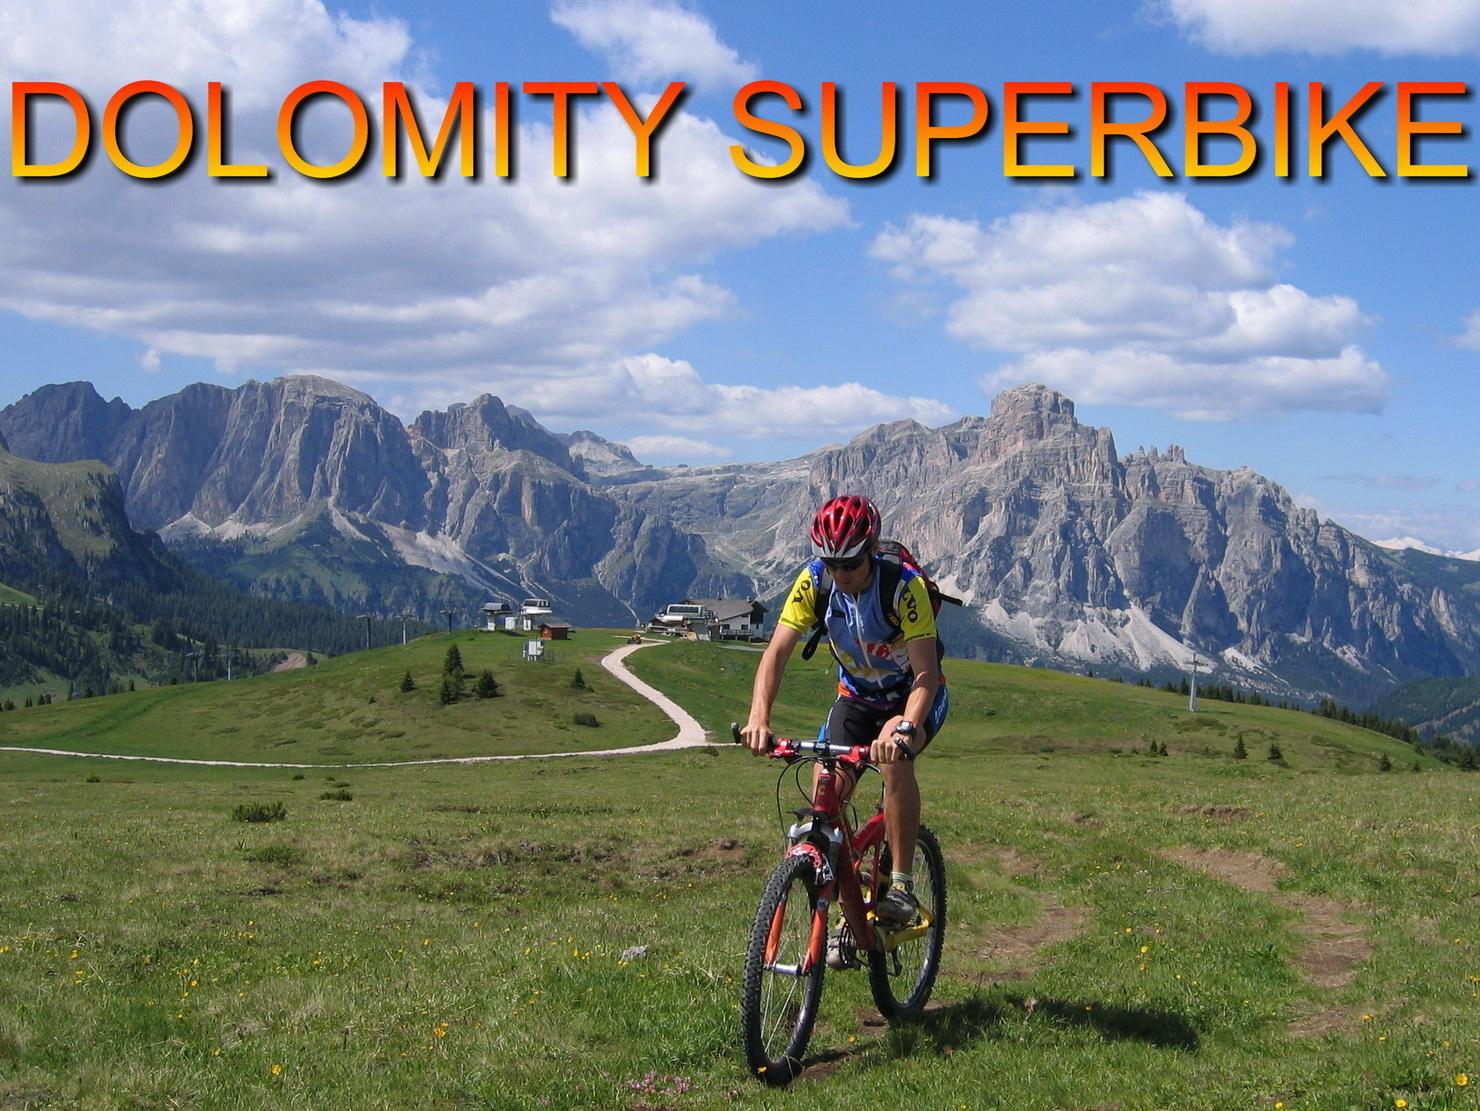 dolomity-superbike